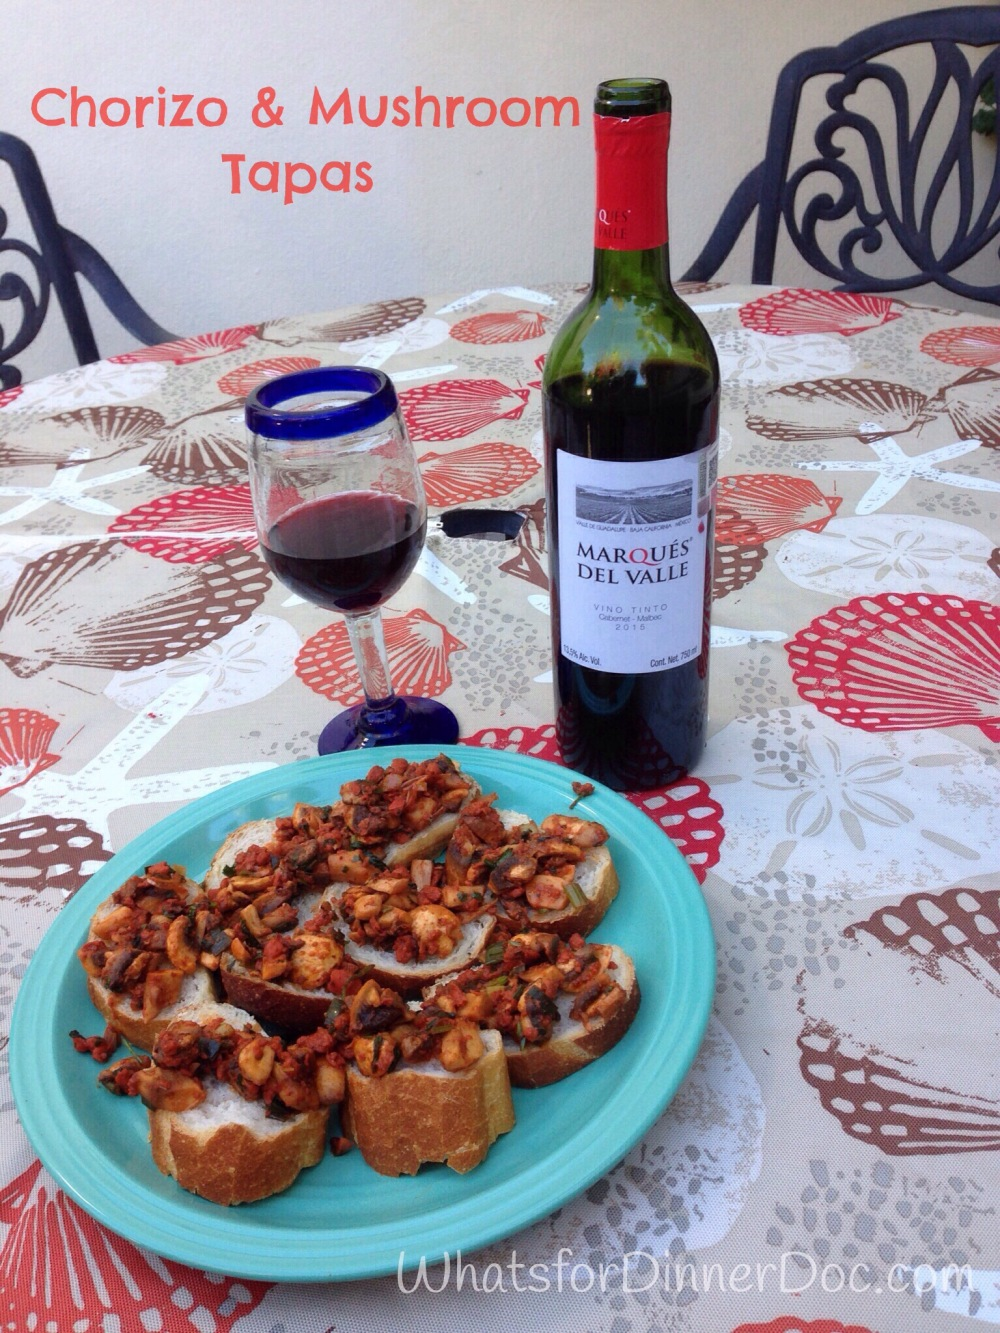 Chorizo and Mushroom Tapas